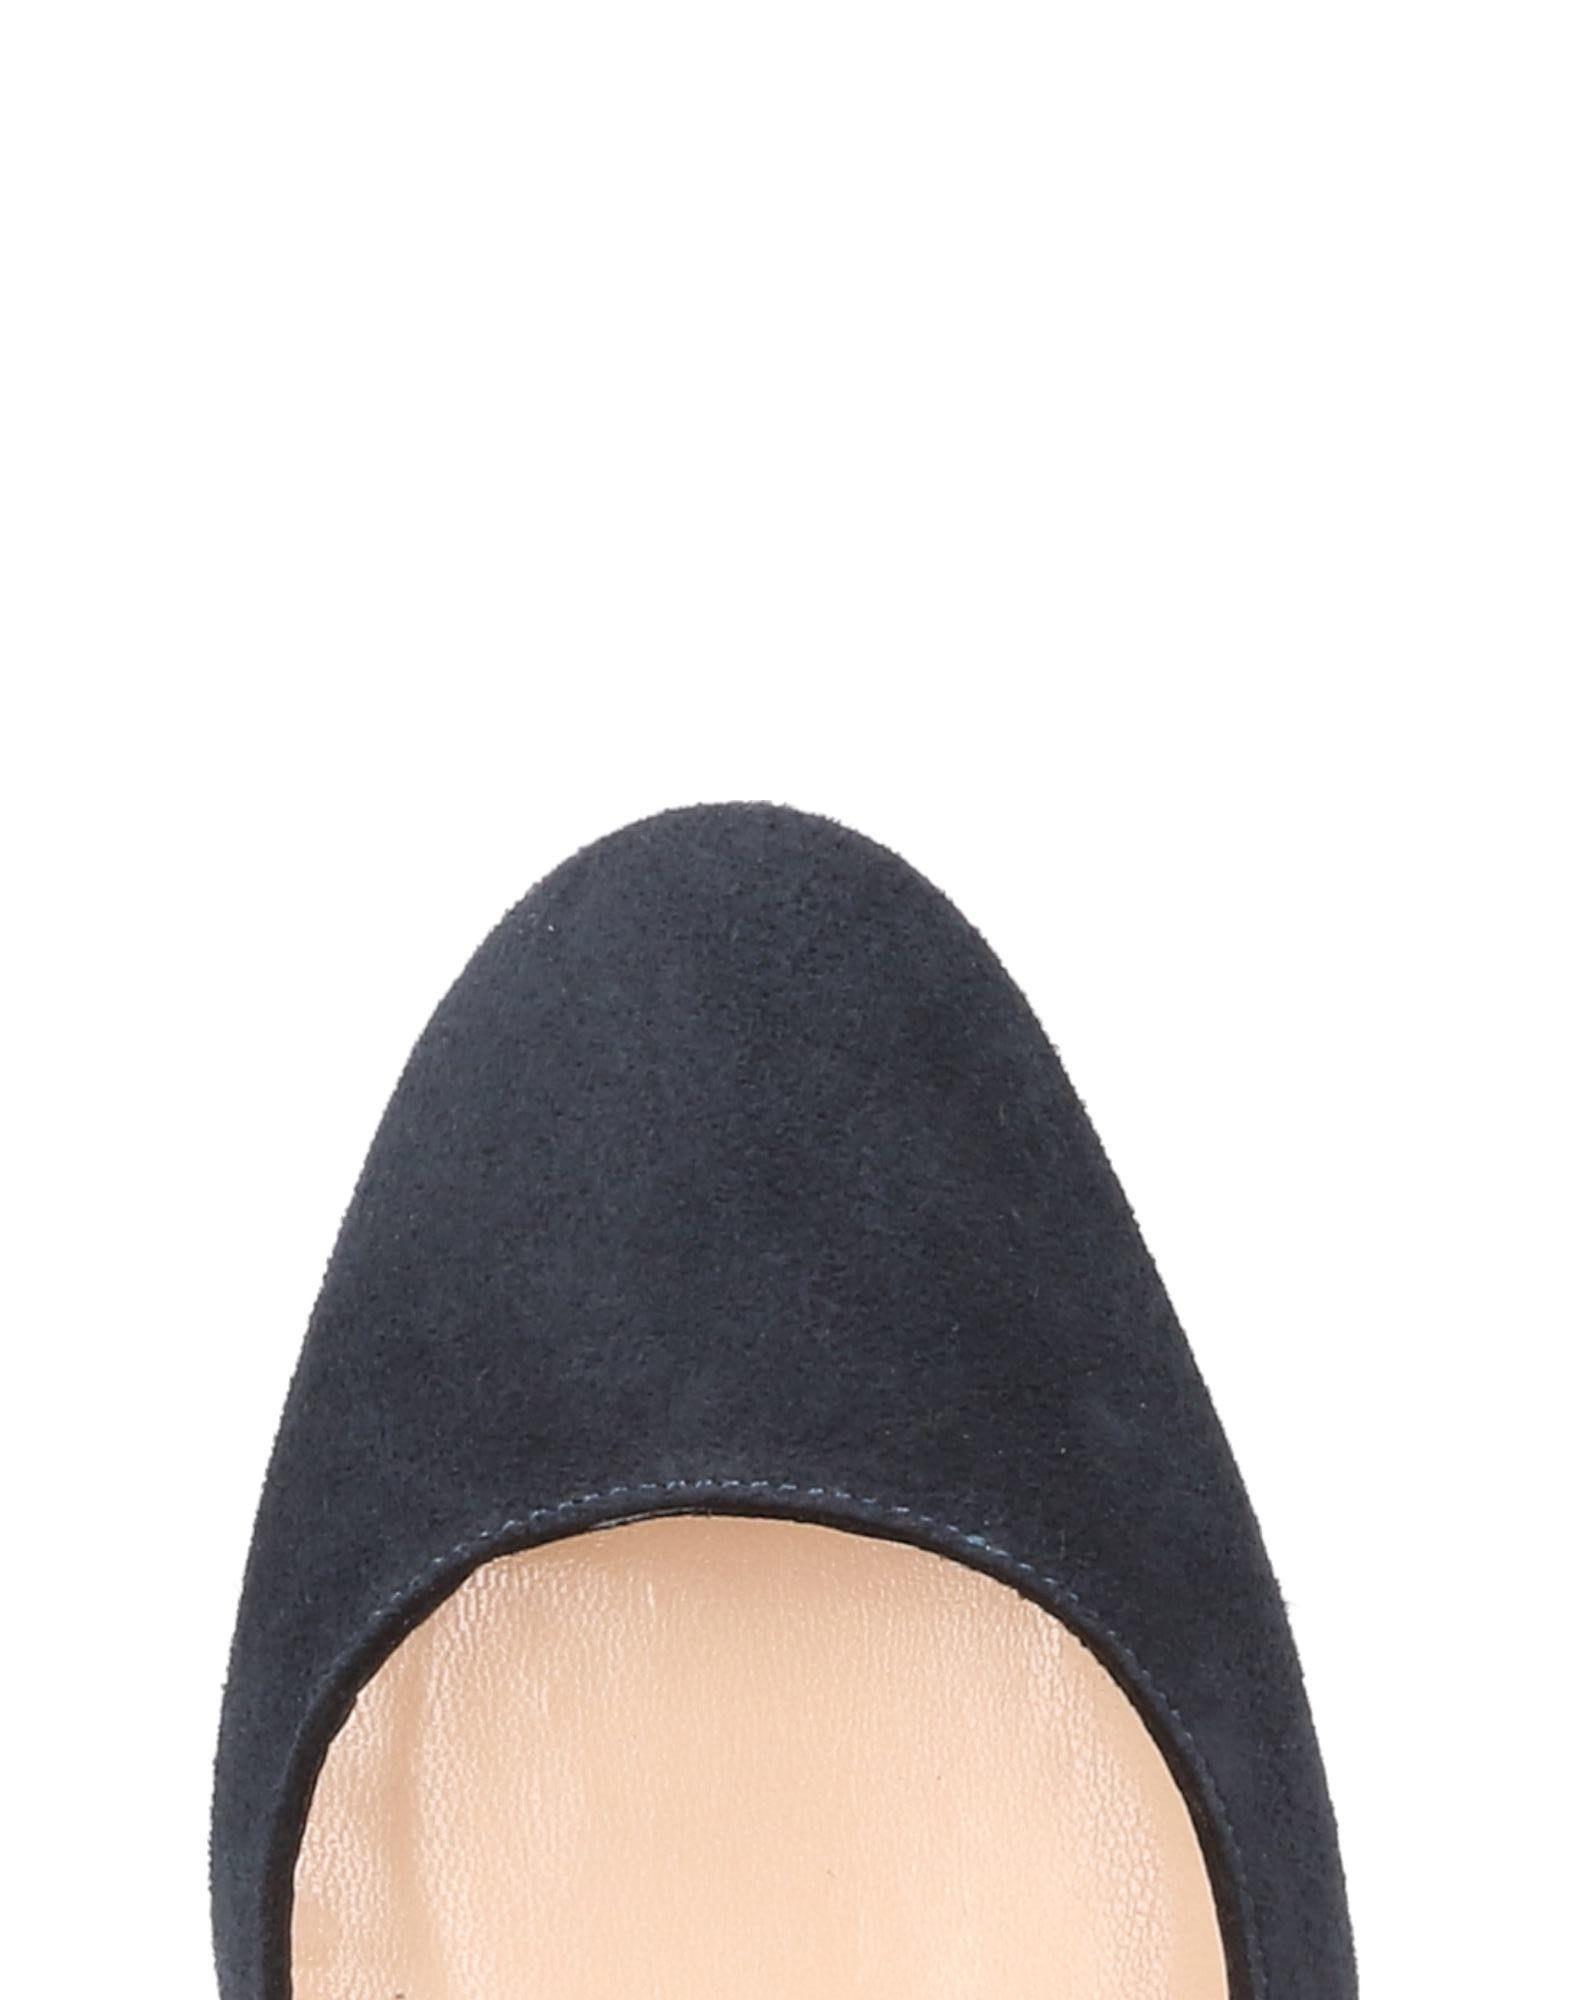 Twiggy Pumps Damen  beliebte 11473195XR Gute Qualität beliebte  Schuhe 16c896